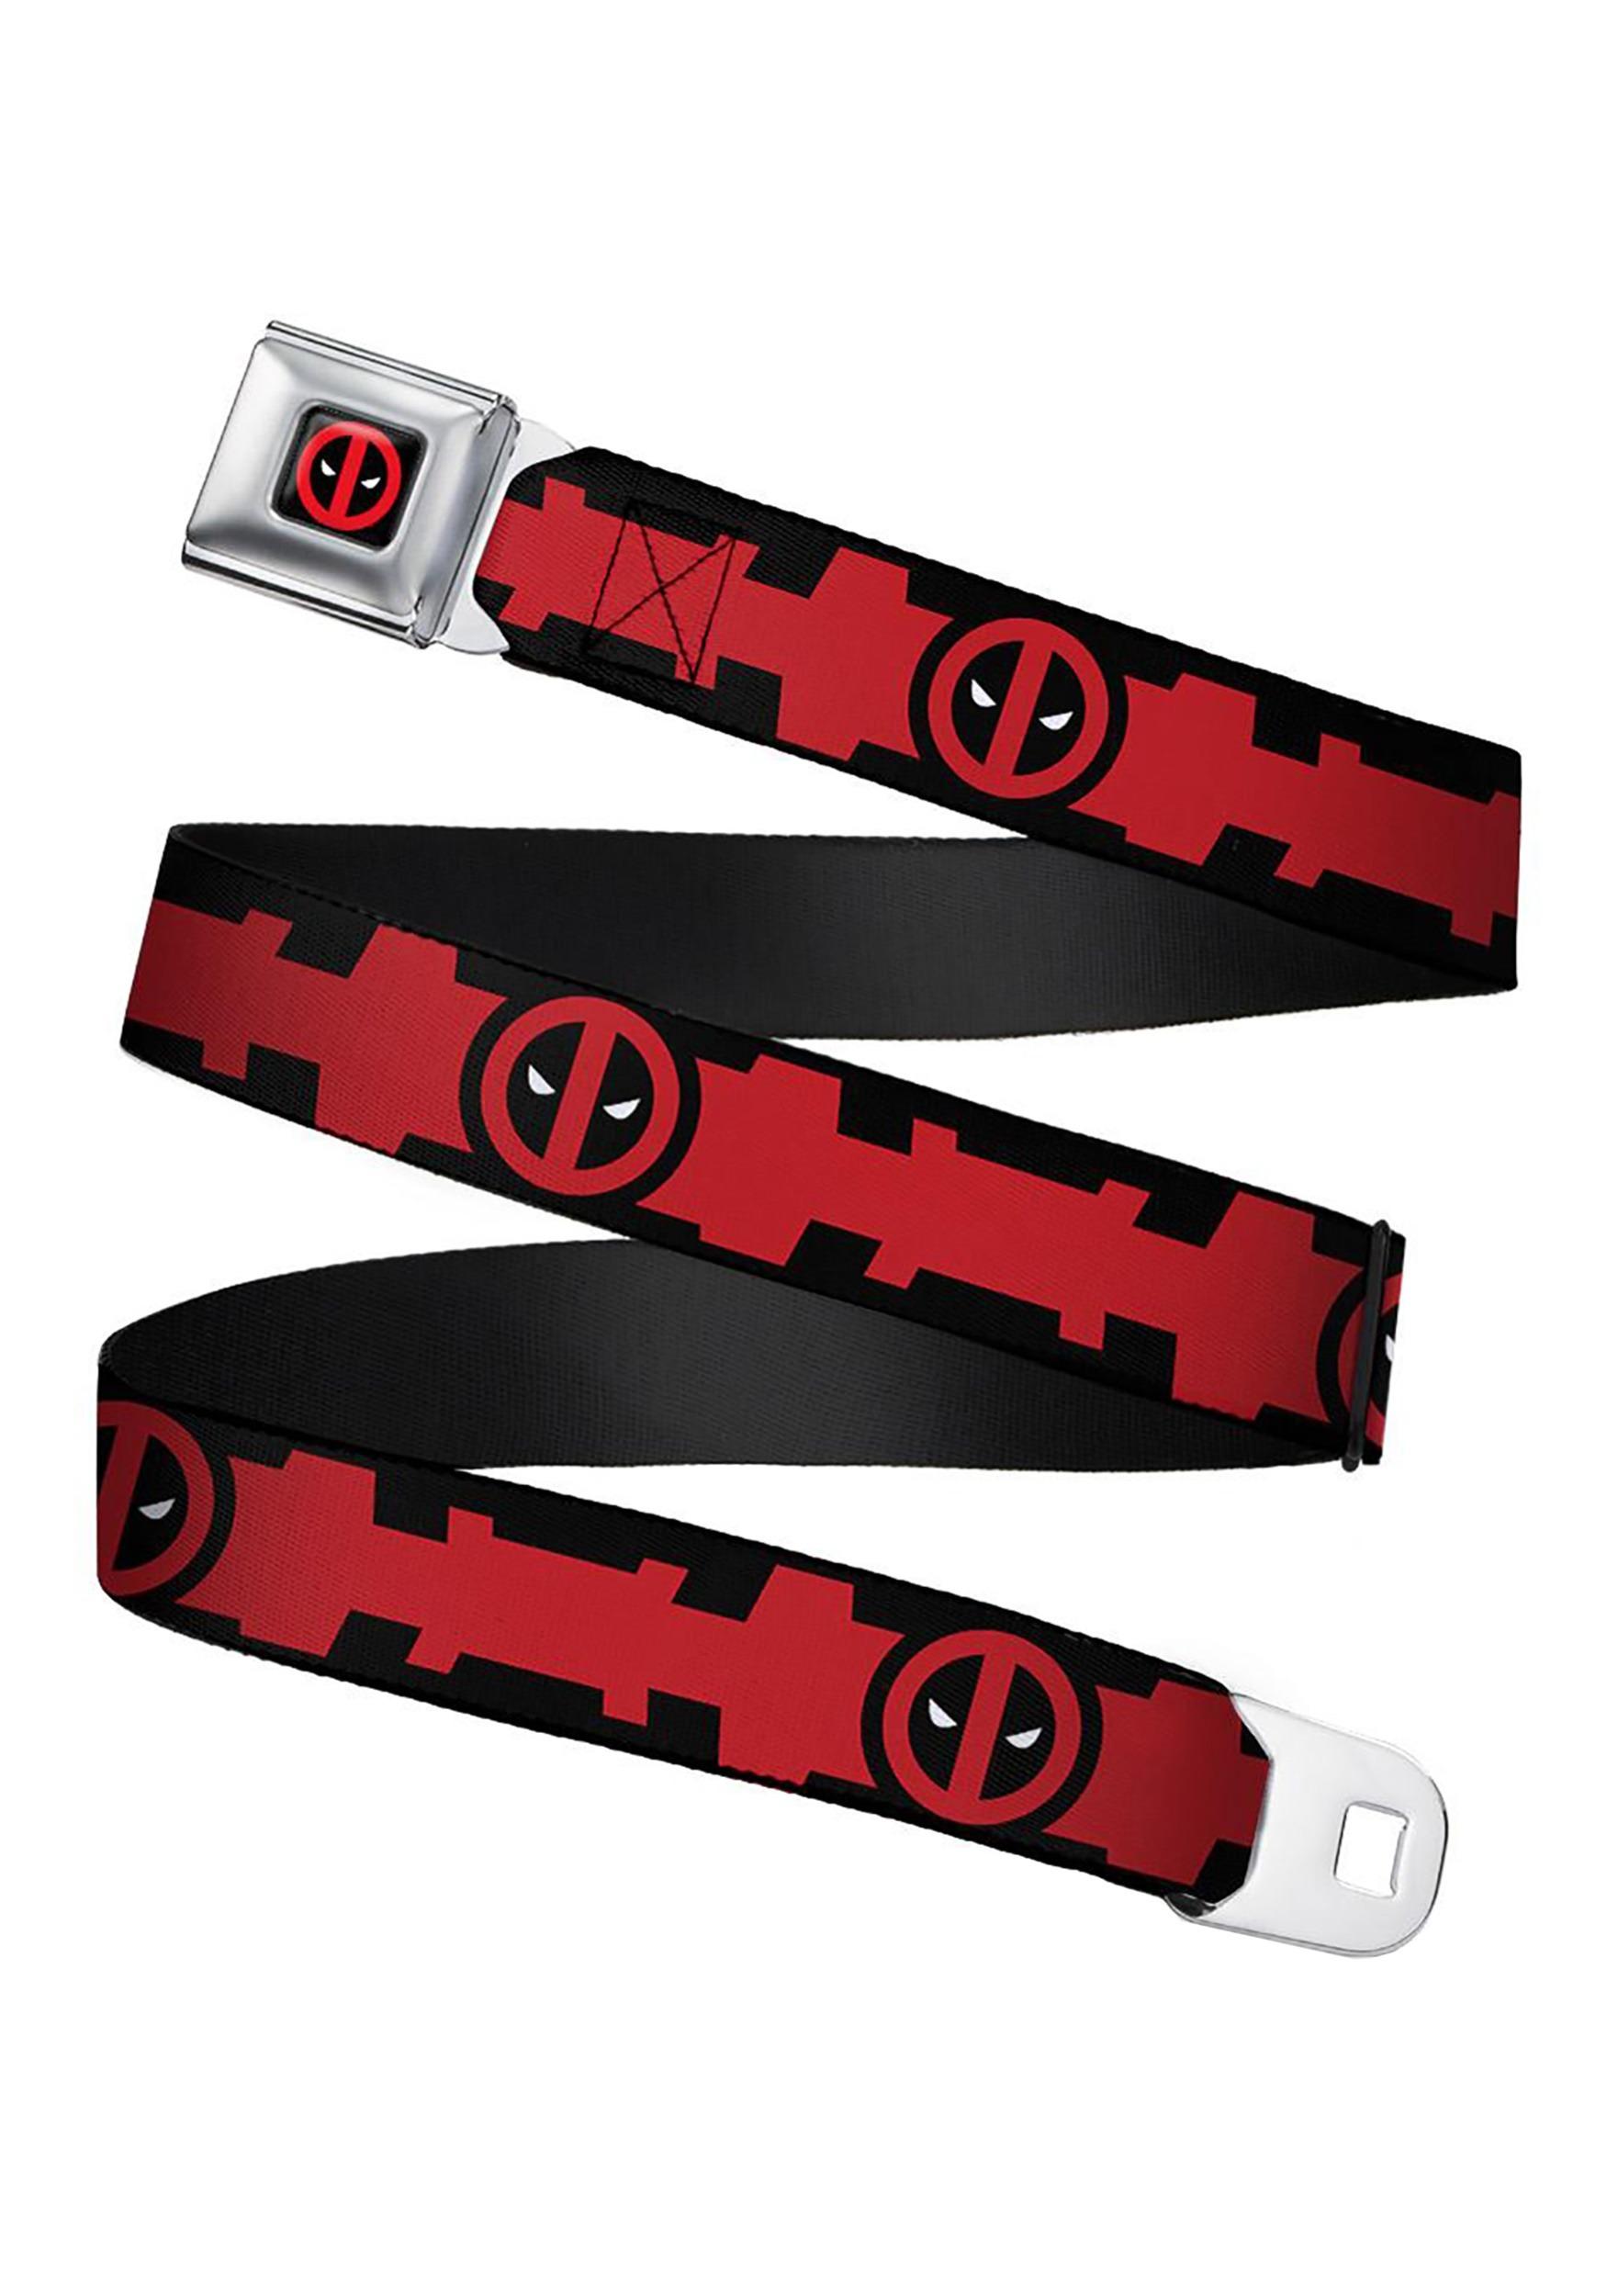 Marvel_Deadpool_Utility_Belt_Seatbelt_Buckle_Belt